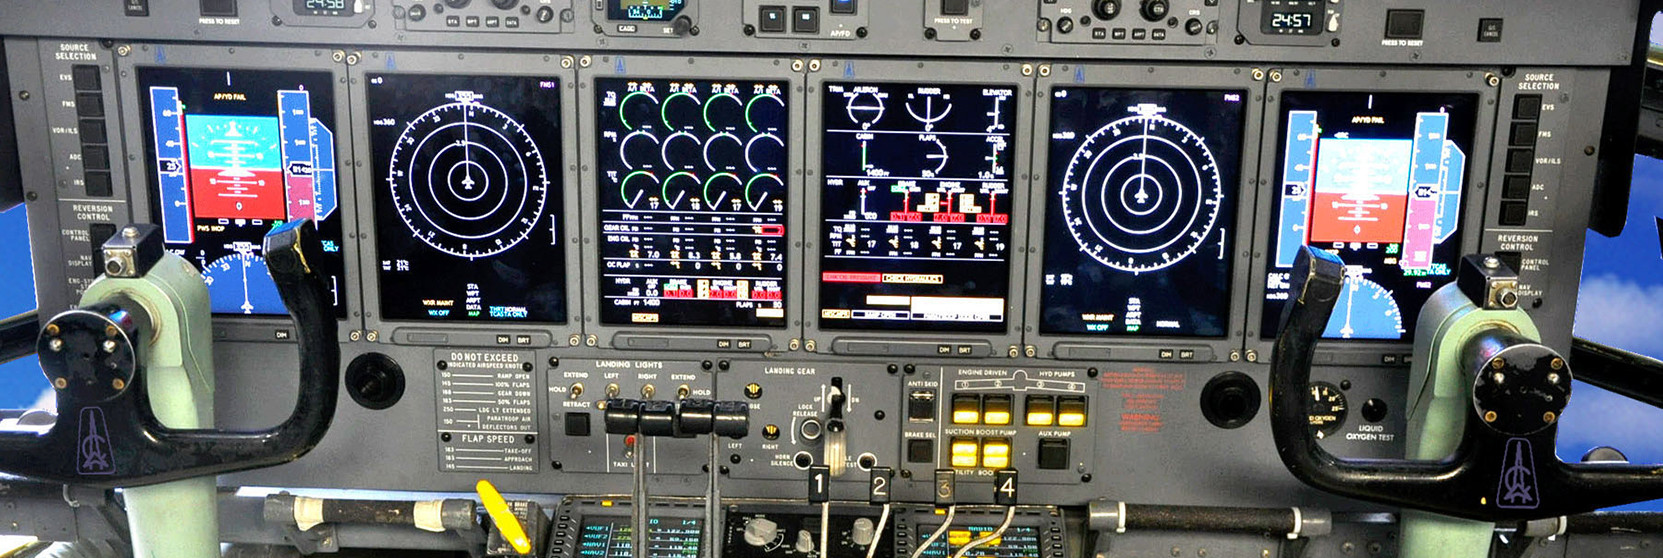 Astronautics C-130 Cockpit_3